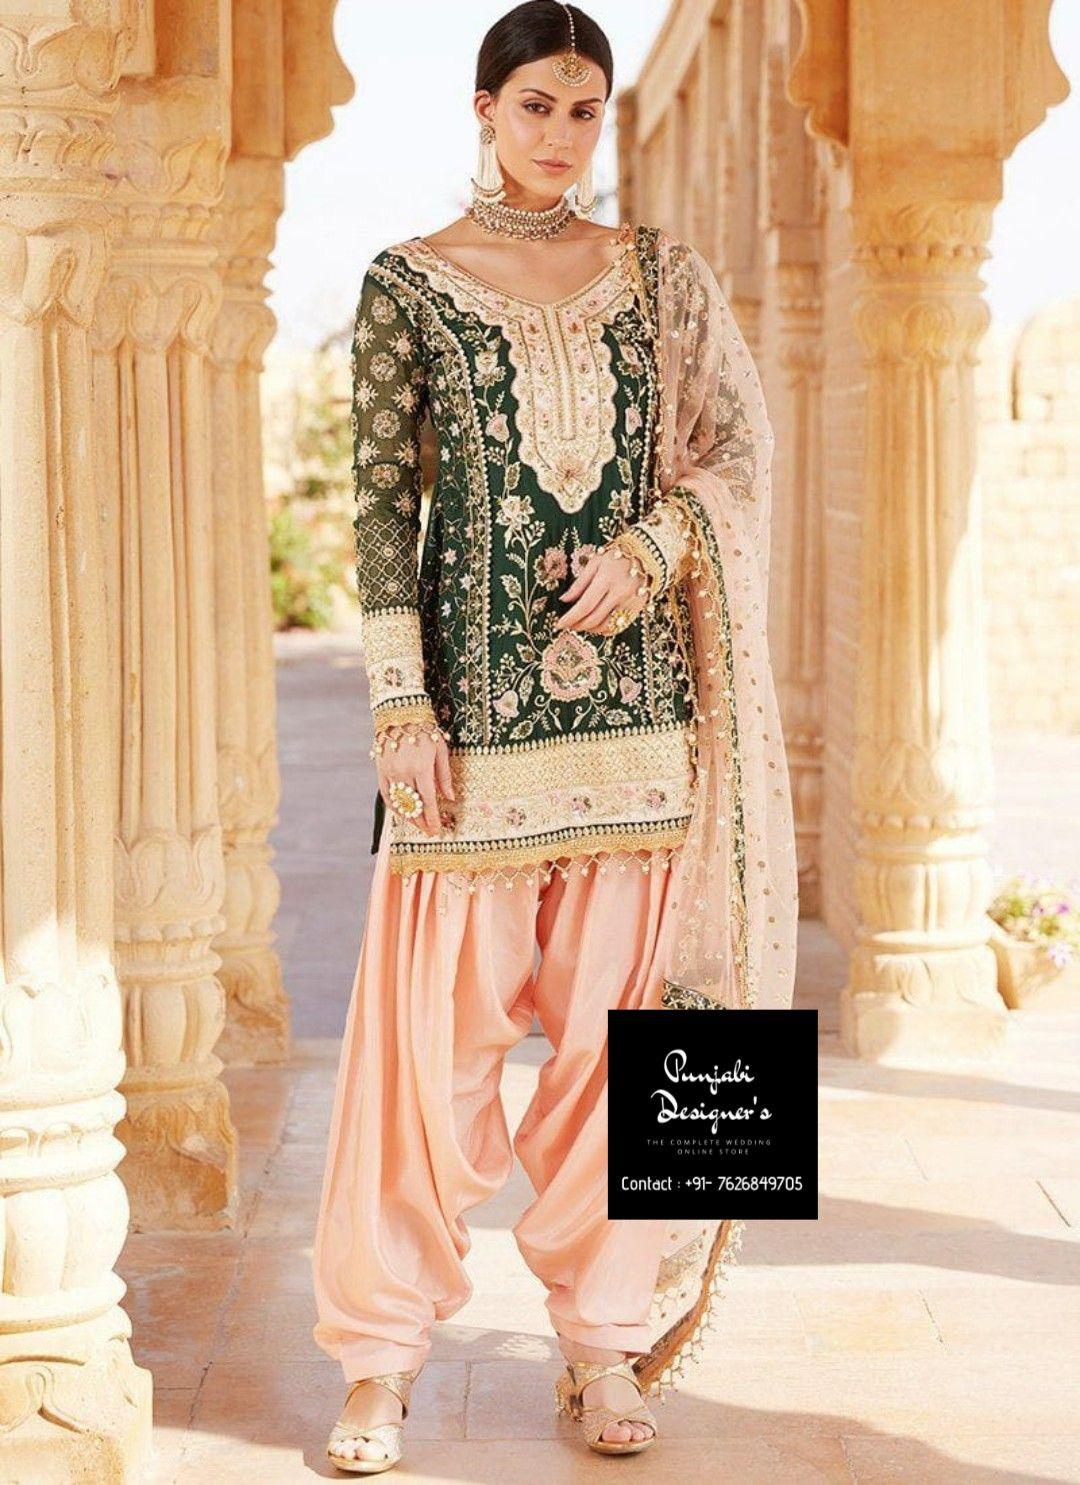 Buy Punjabi Suit Online India Buy Punjabi Suit Online Malaysia Buy Punjabi Suit Online Canada Jas Pengantin Lehenga Lehenga Choli